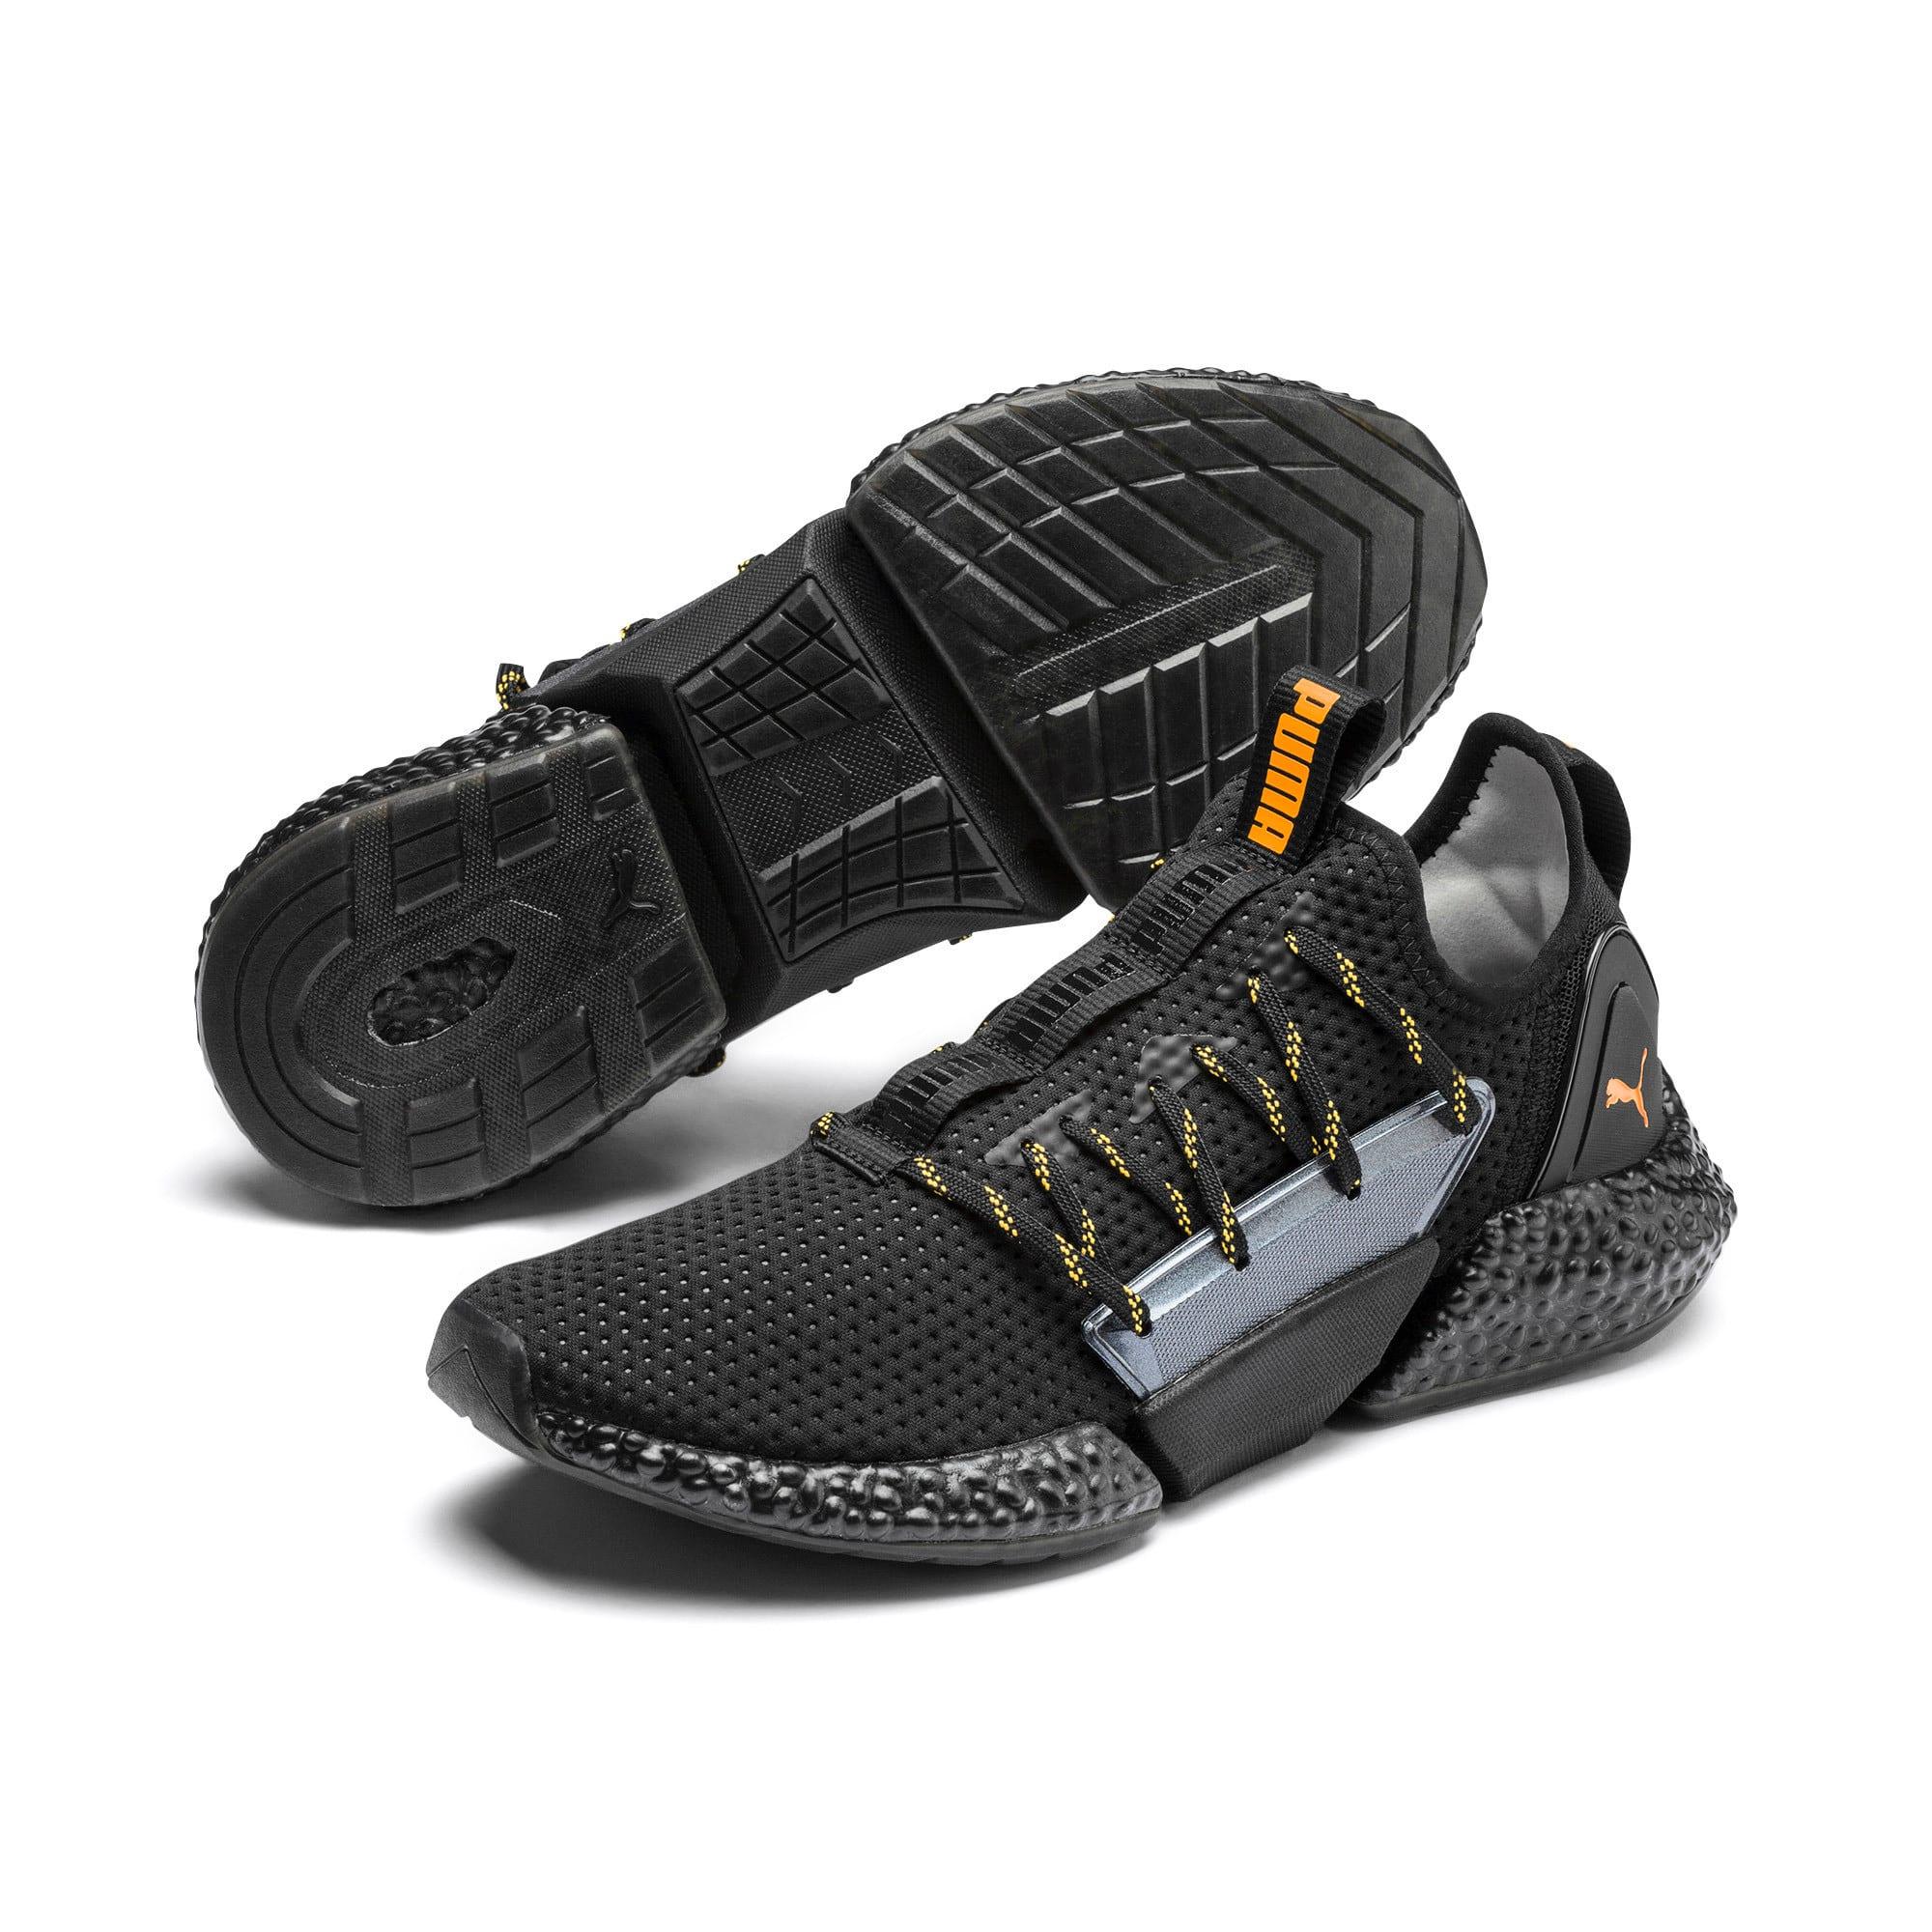 Thumbnail 3 of HYBRID Rocket Aero Men's Sneakers, Puma Black-Puma Black, medium